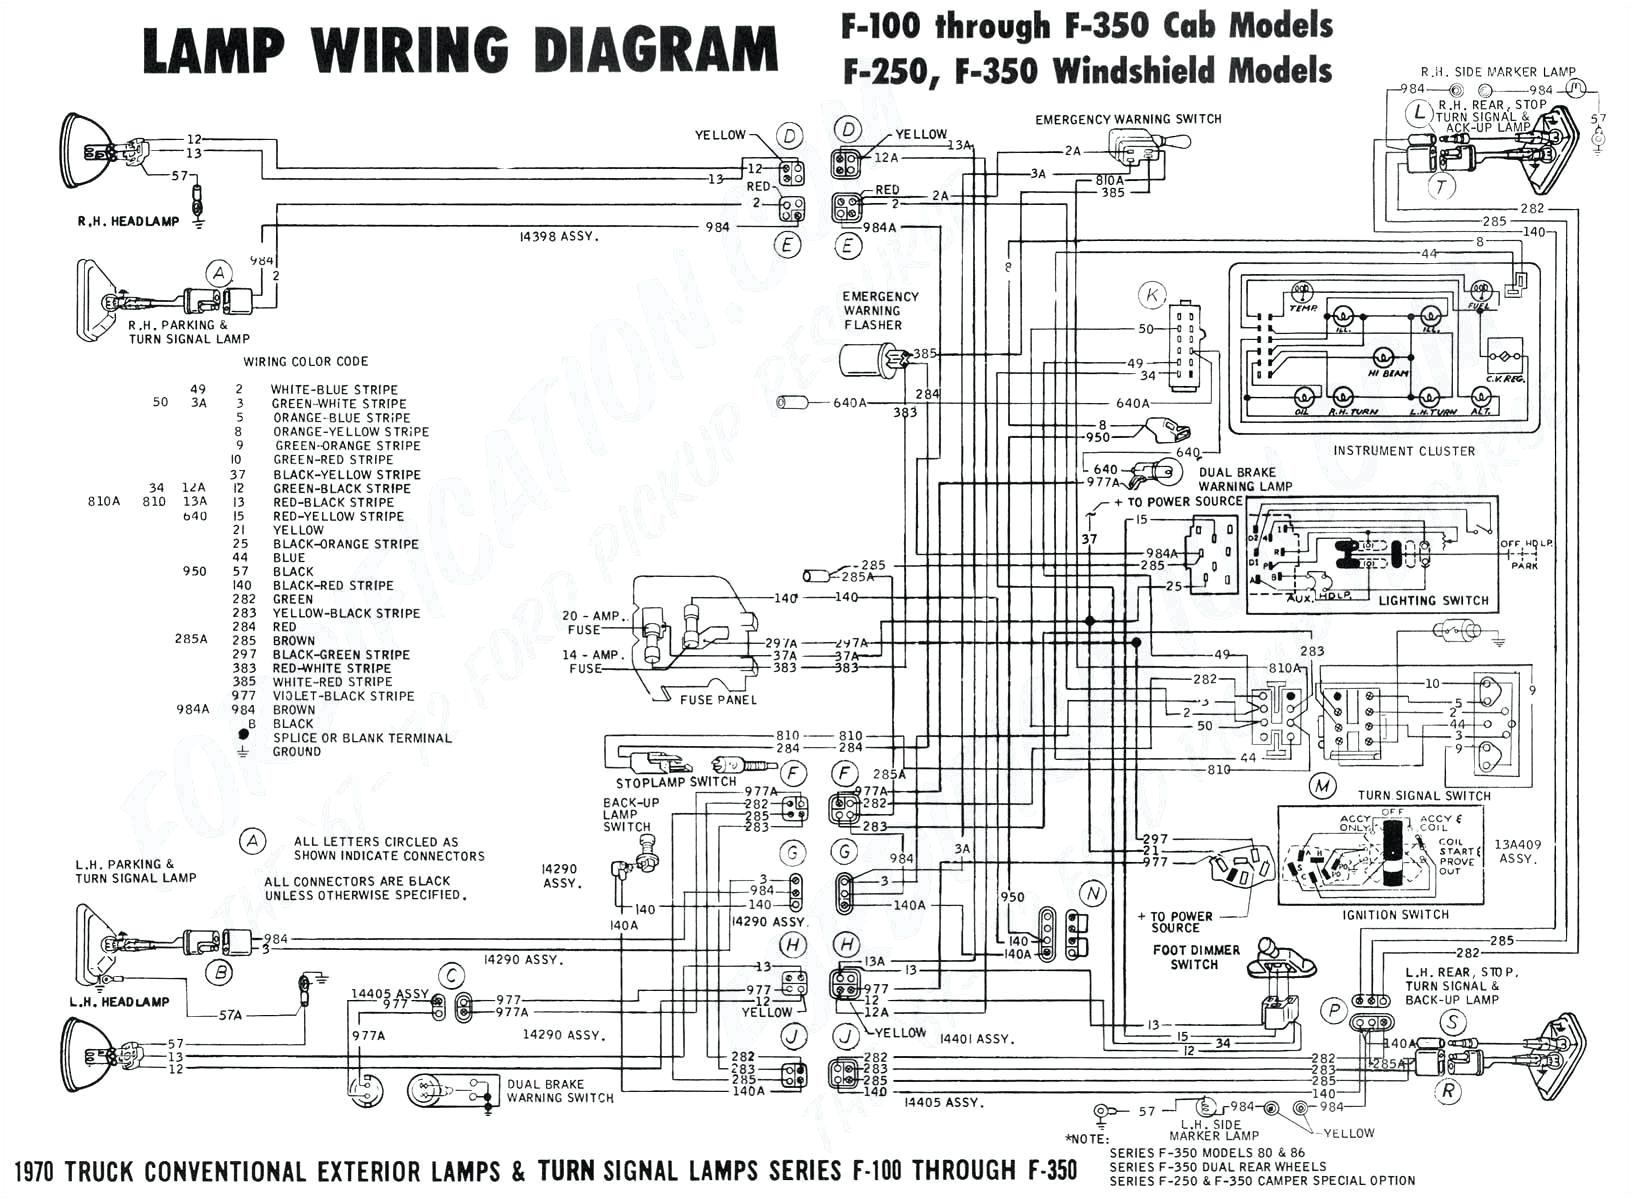 mitsubishi headlight wiring diagram wiring diagram technicheadlight wiring harness for 2001 mitsubishi eclipse wiring2002 mitsubishi eclipse